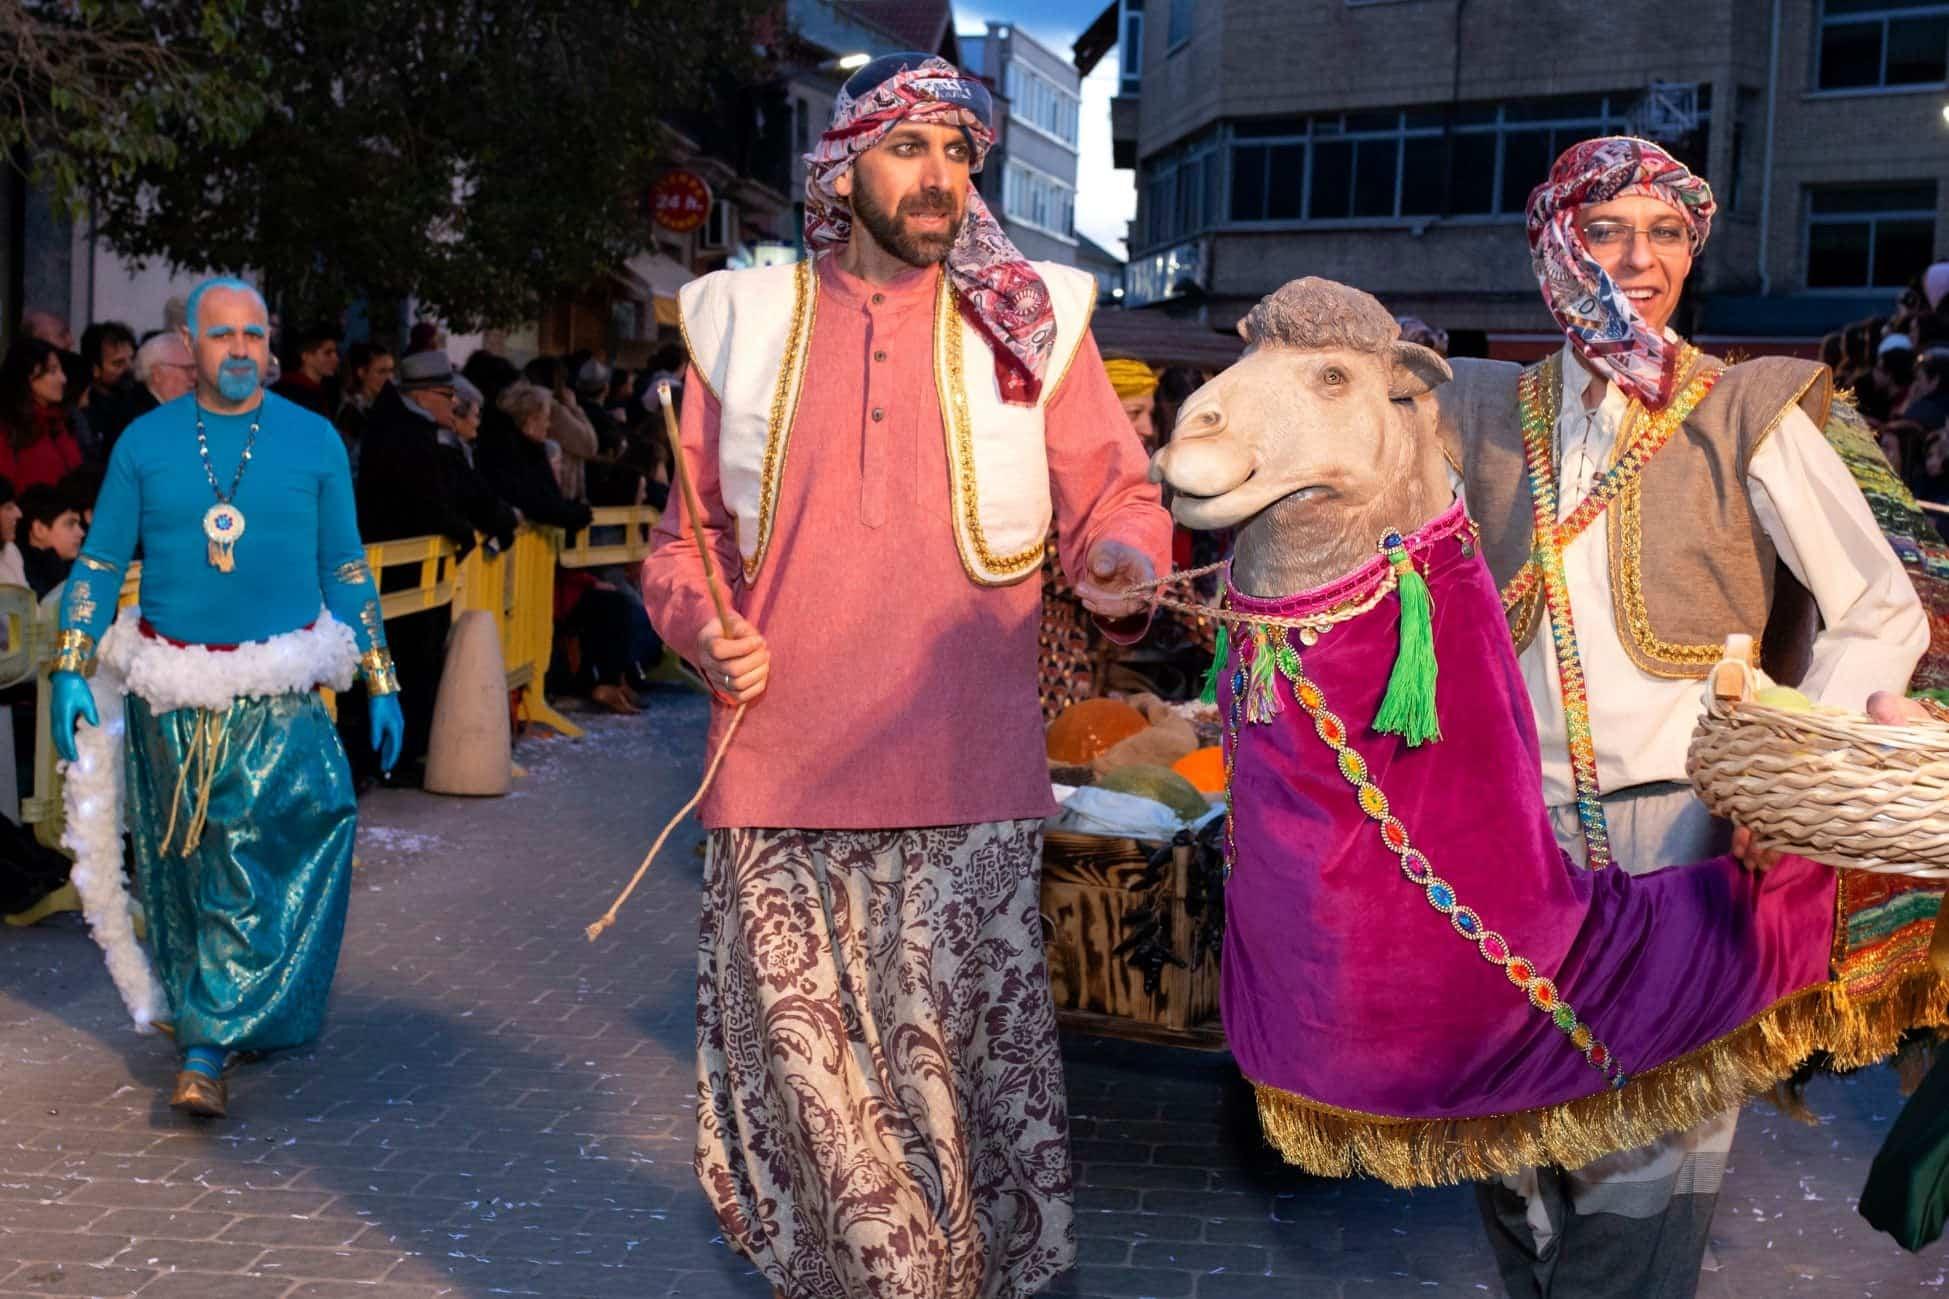 Carnaval de herencia 2020 ofertorio 39 - Selección de fotografías del Ofertorio del Carnaval de Herencia